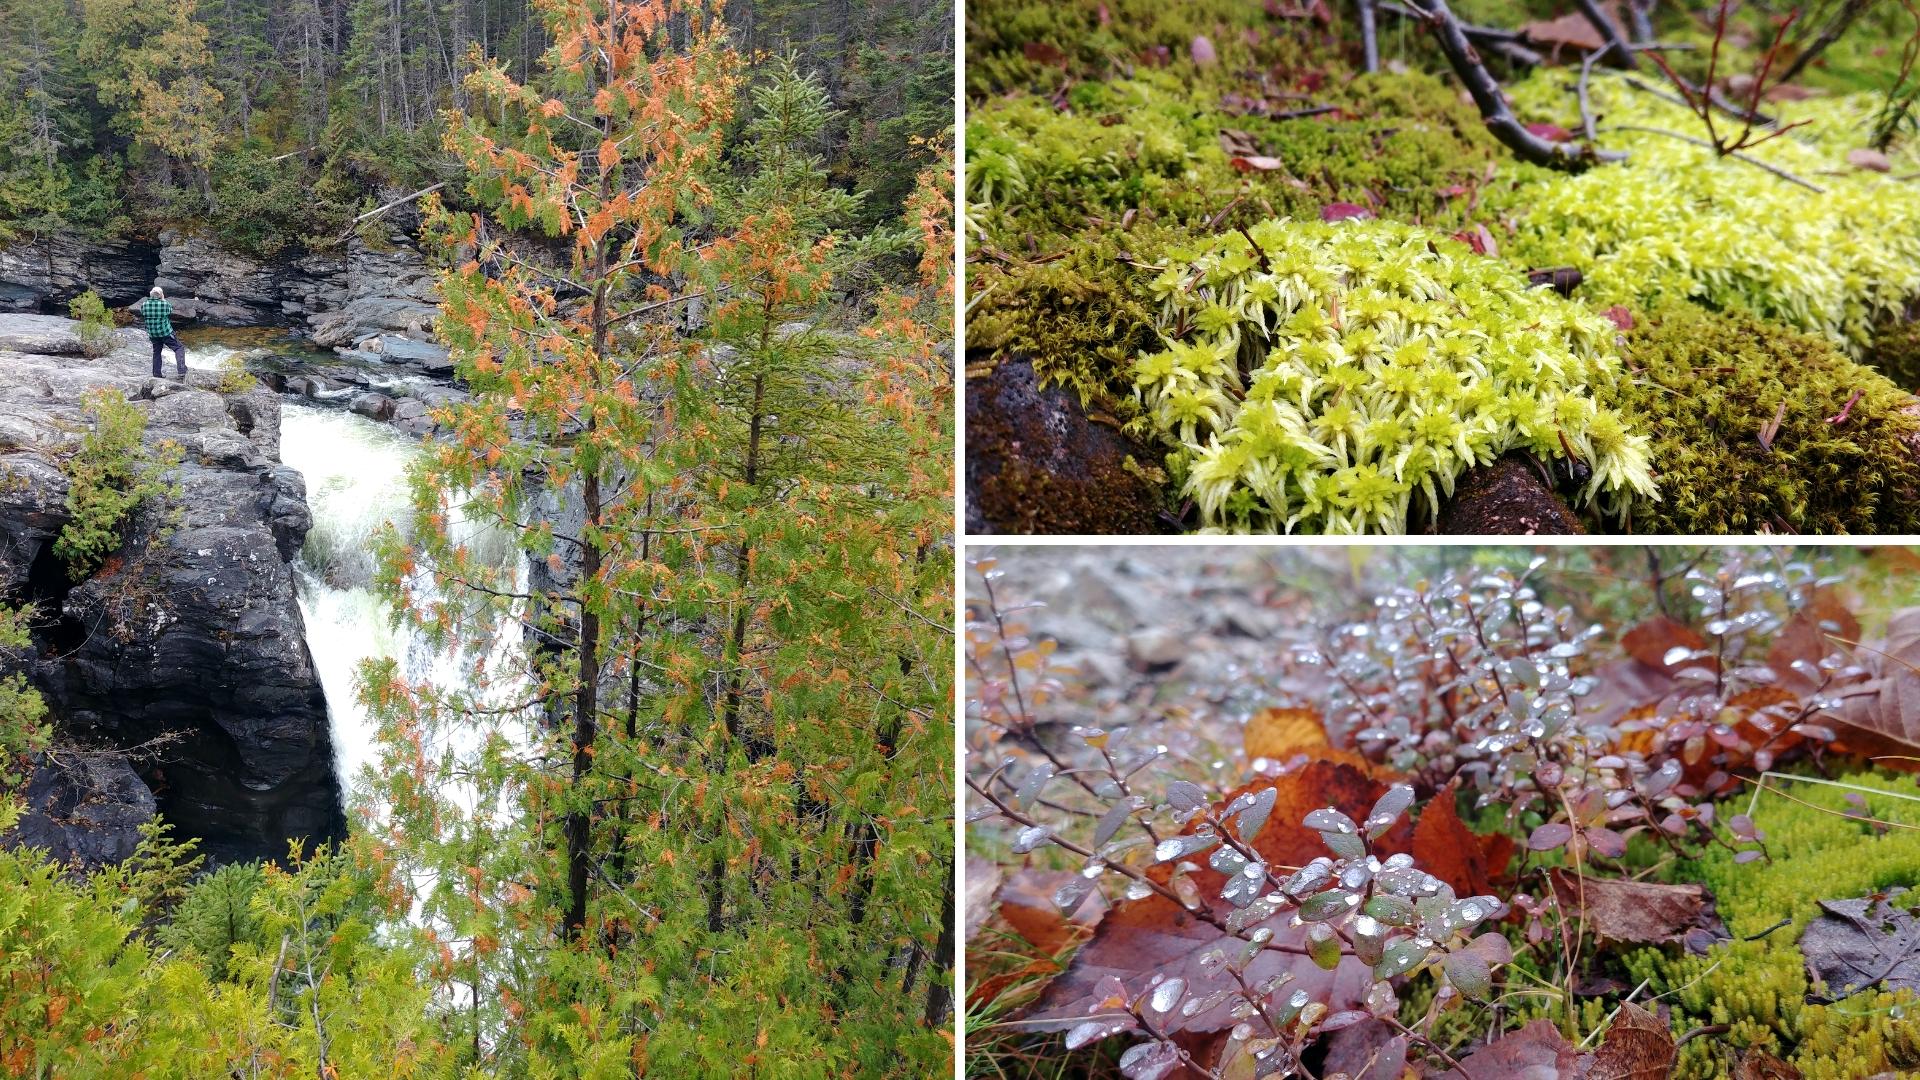 chutes sainte-anne randonnee gaspesie automne blog voyage canada road-trip arpenter le chemin